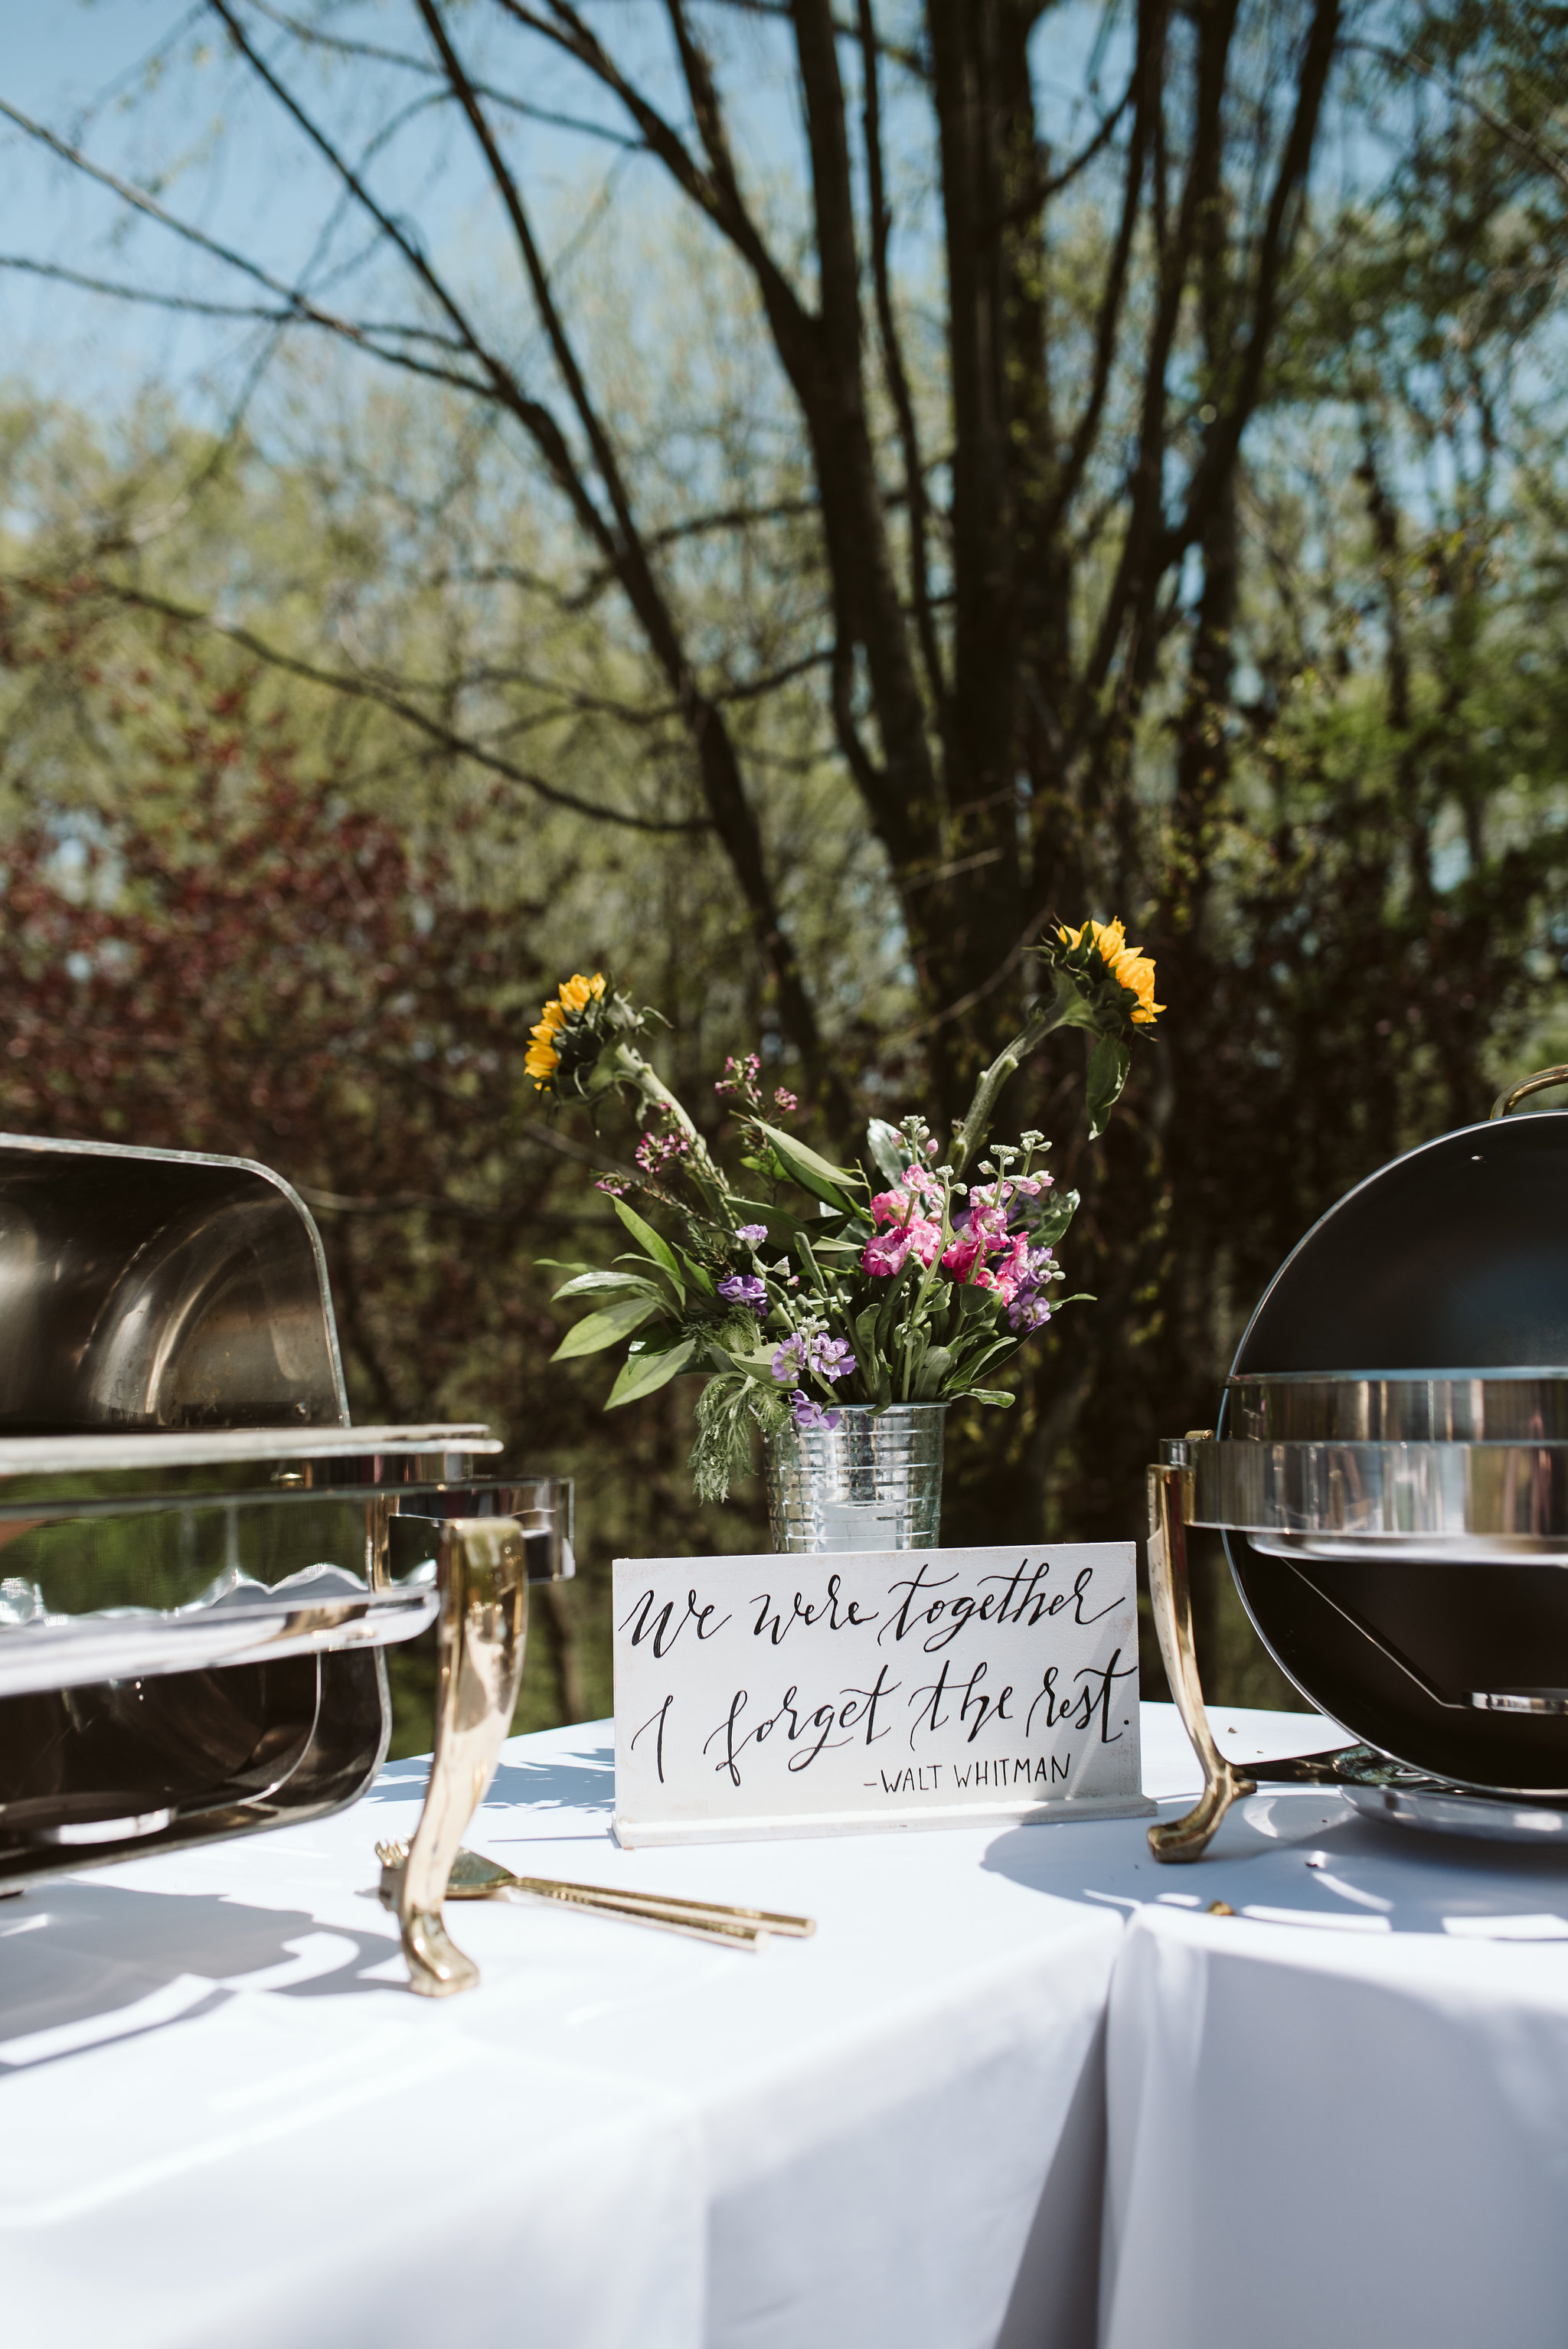 Spring Outdoor Wedding, Park, Baltimore Wedding Photographer, DIY, Classic, Upcycled, Garden Party, Romantic, Reception Decor, Handmade Signage, Walt Whitman Quote